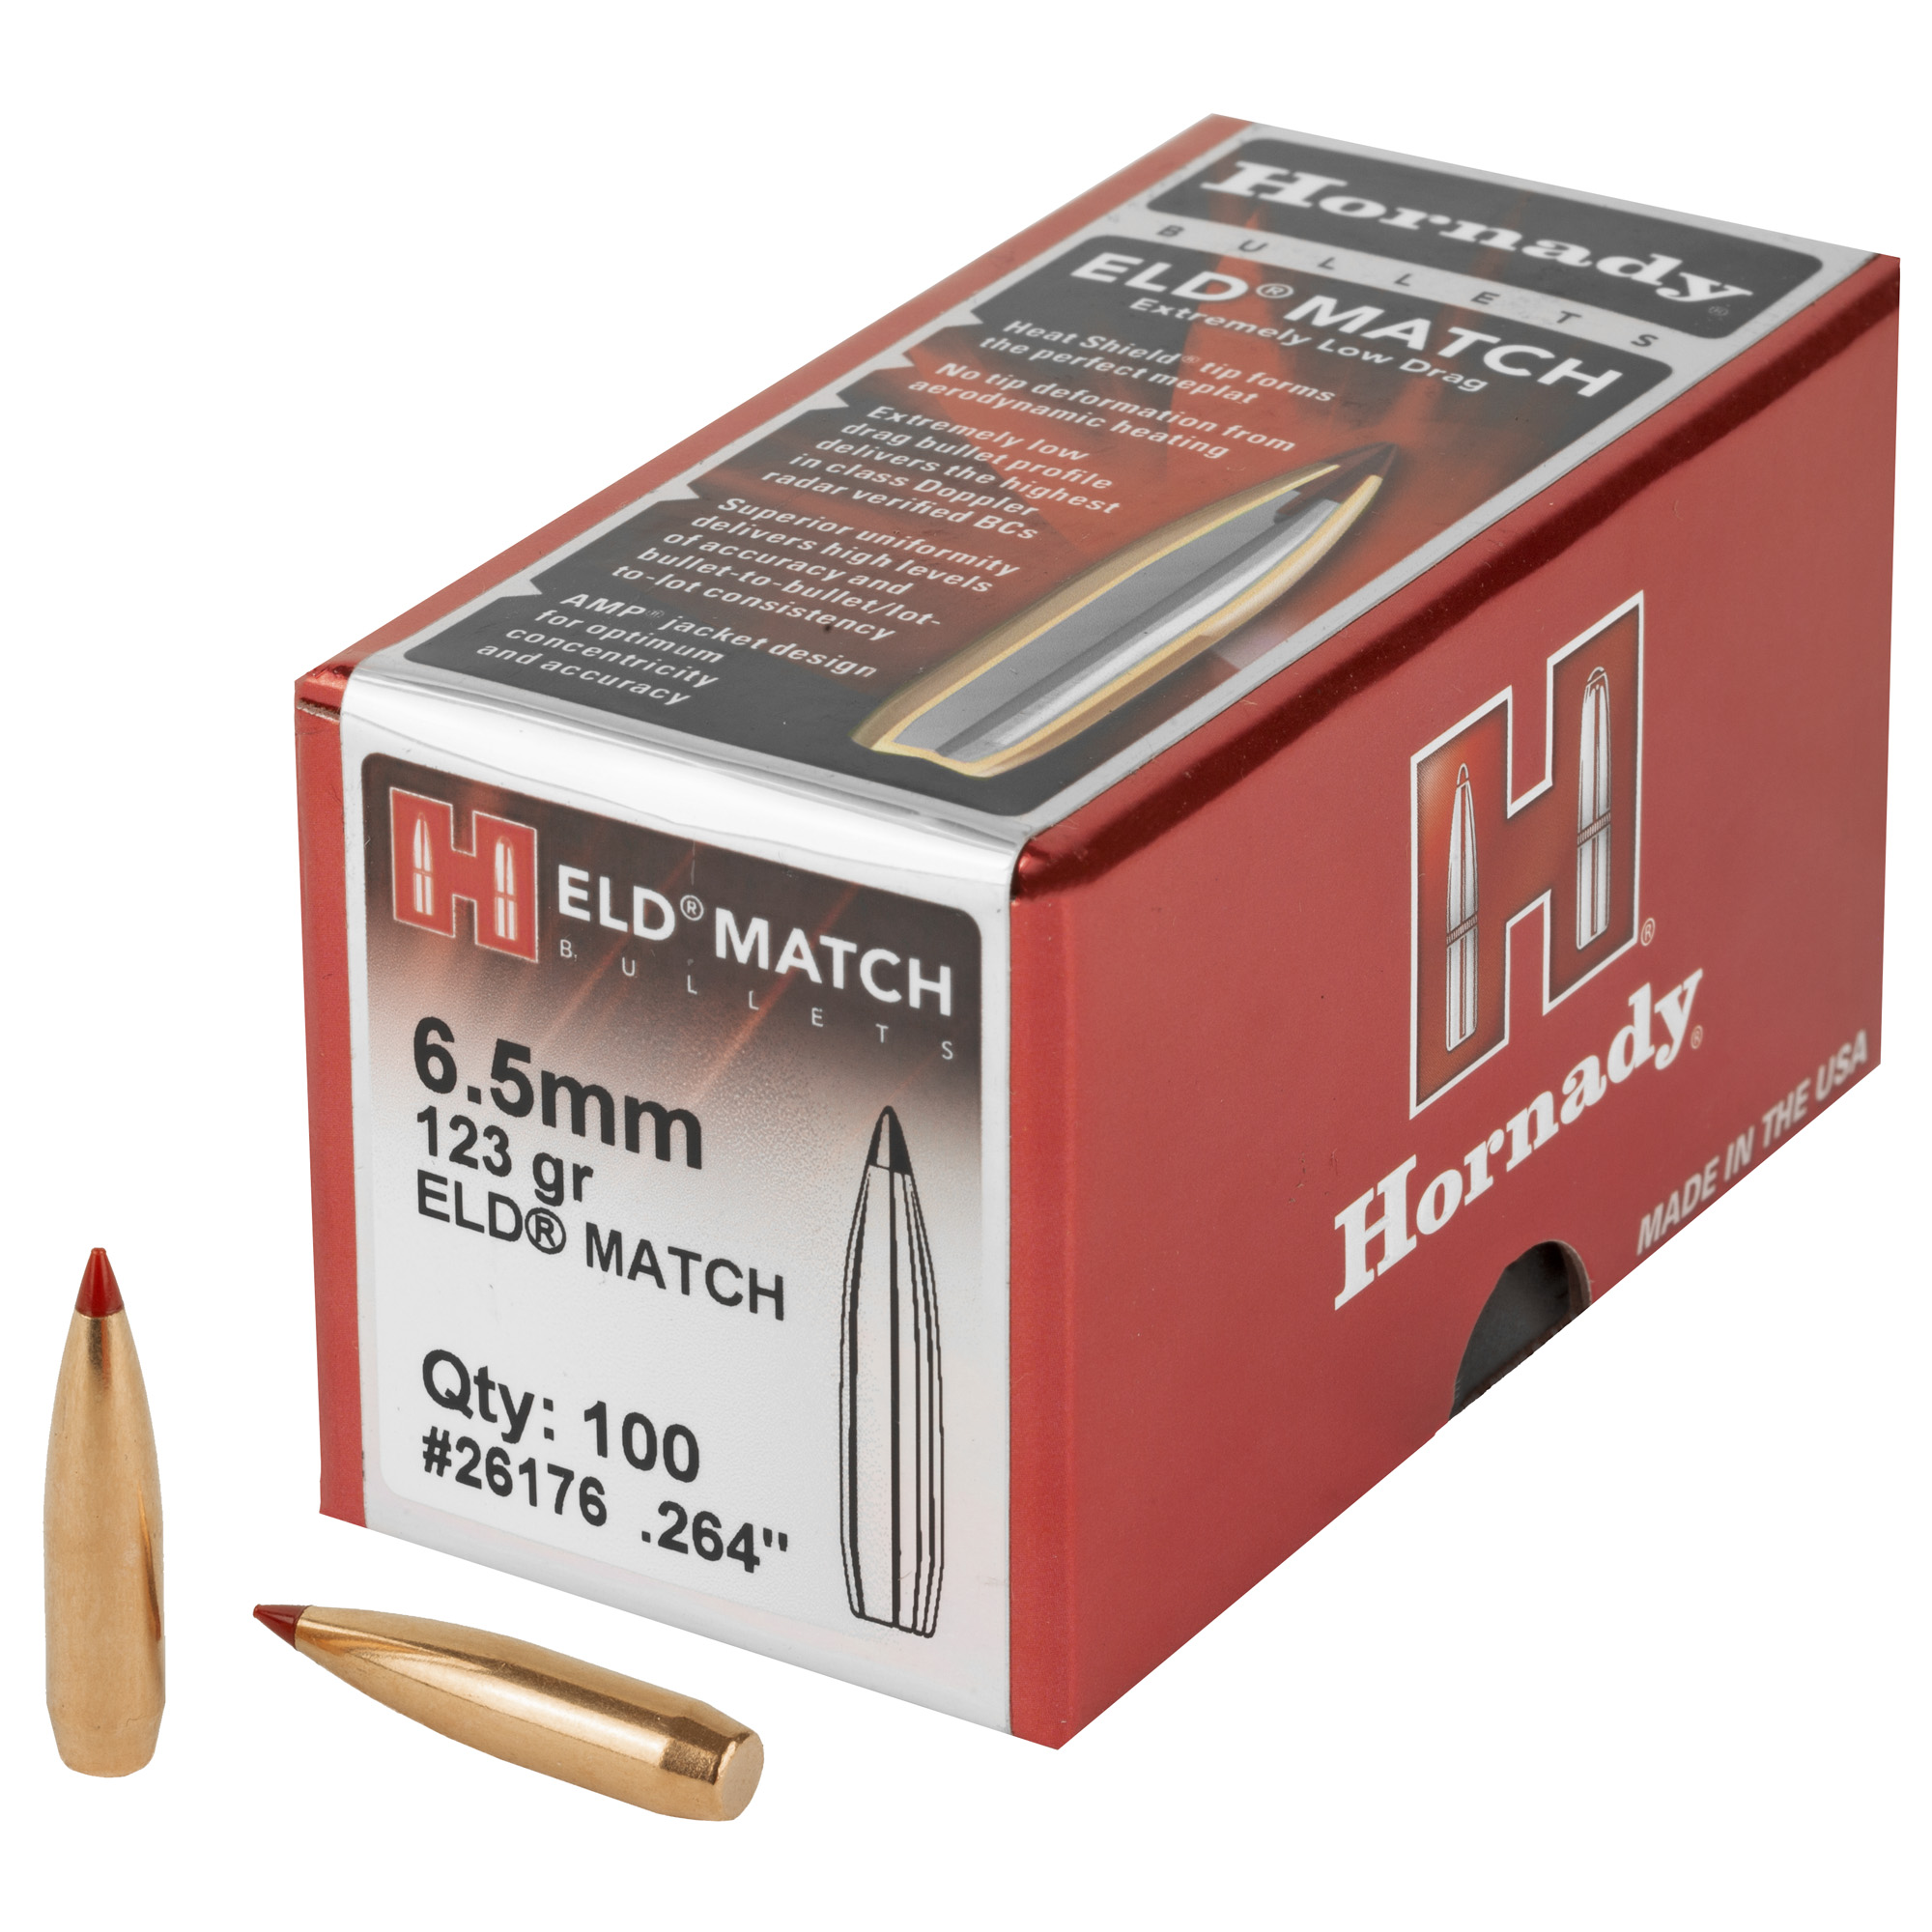 Hrndy Eld-m 6.5mm .264 123gr 100ct